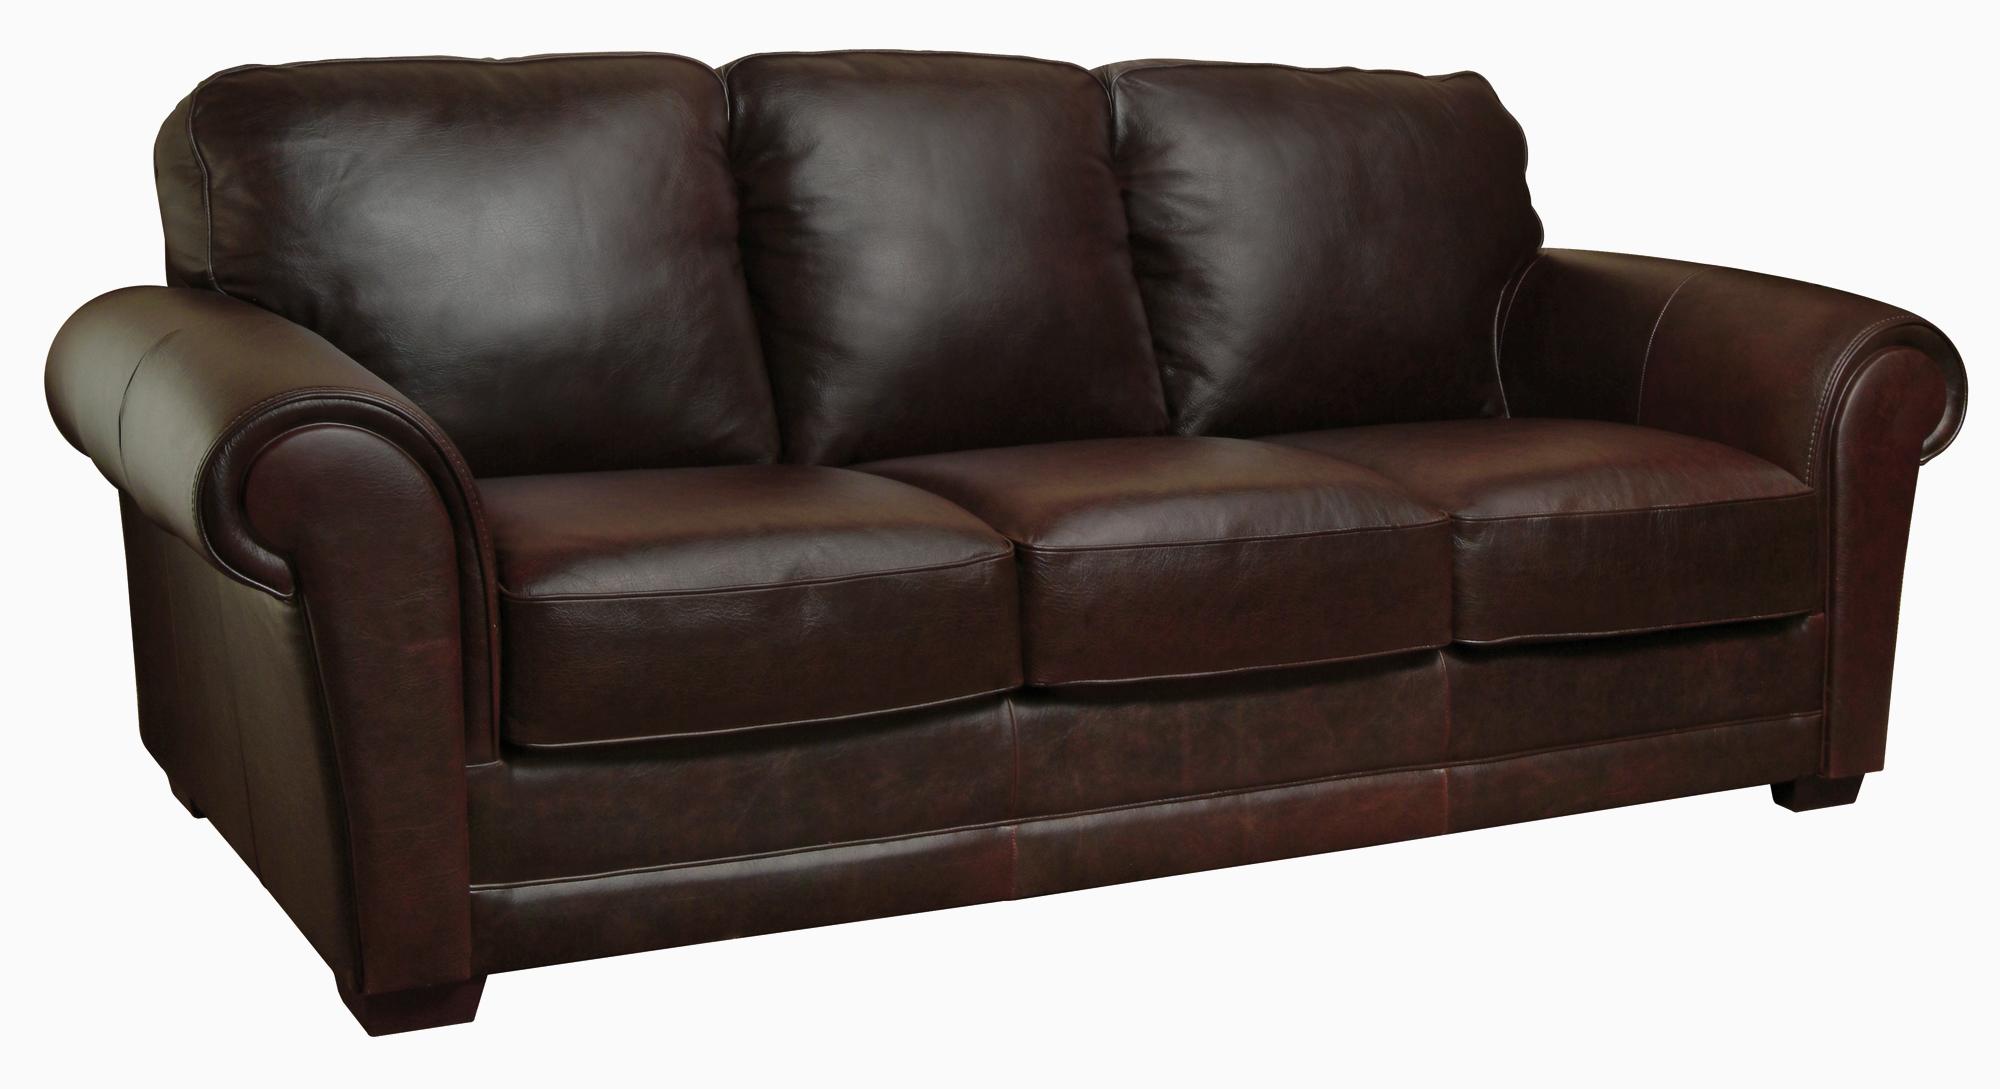 New Luke Leather Mark Italian Leather Distressed Chocolate Brown Sofa Only  eBay